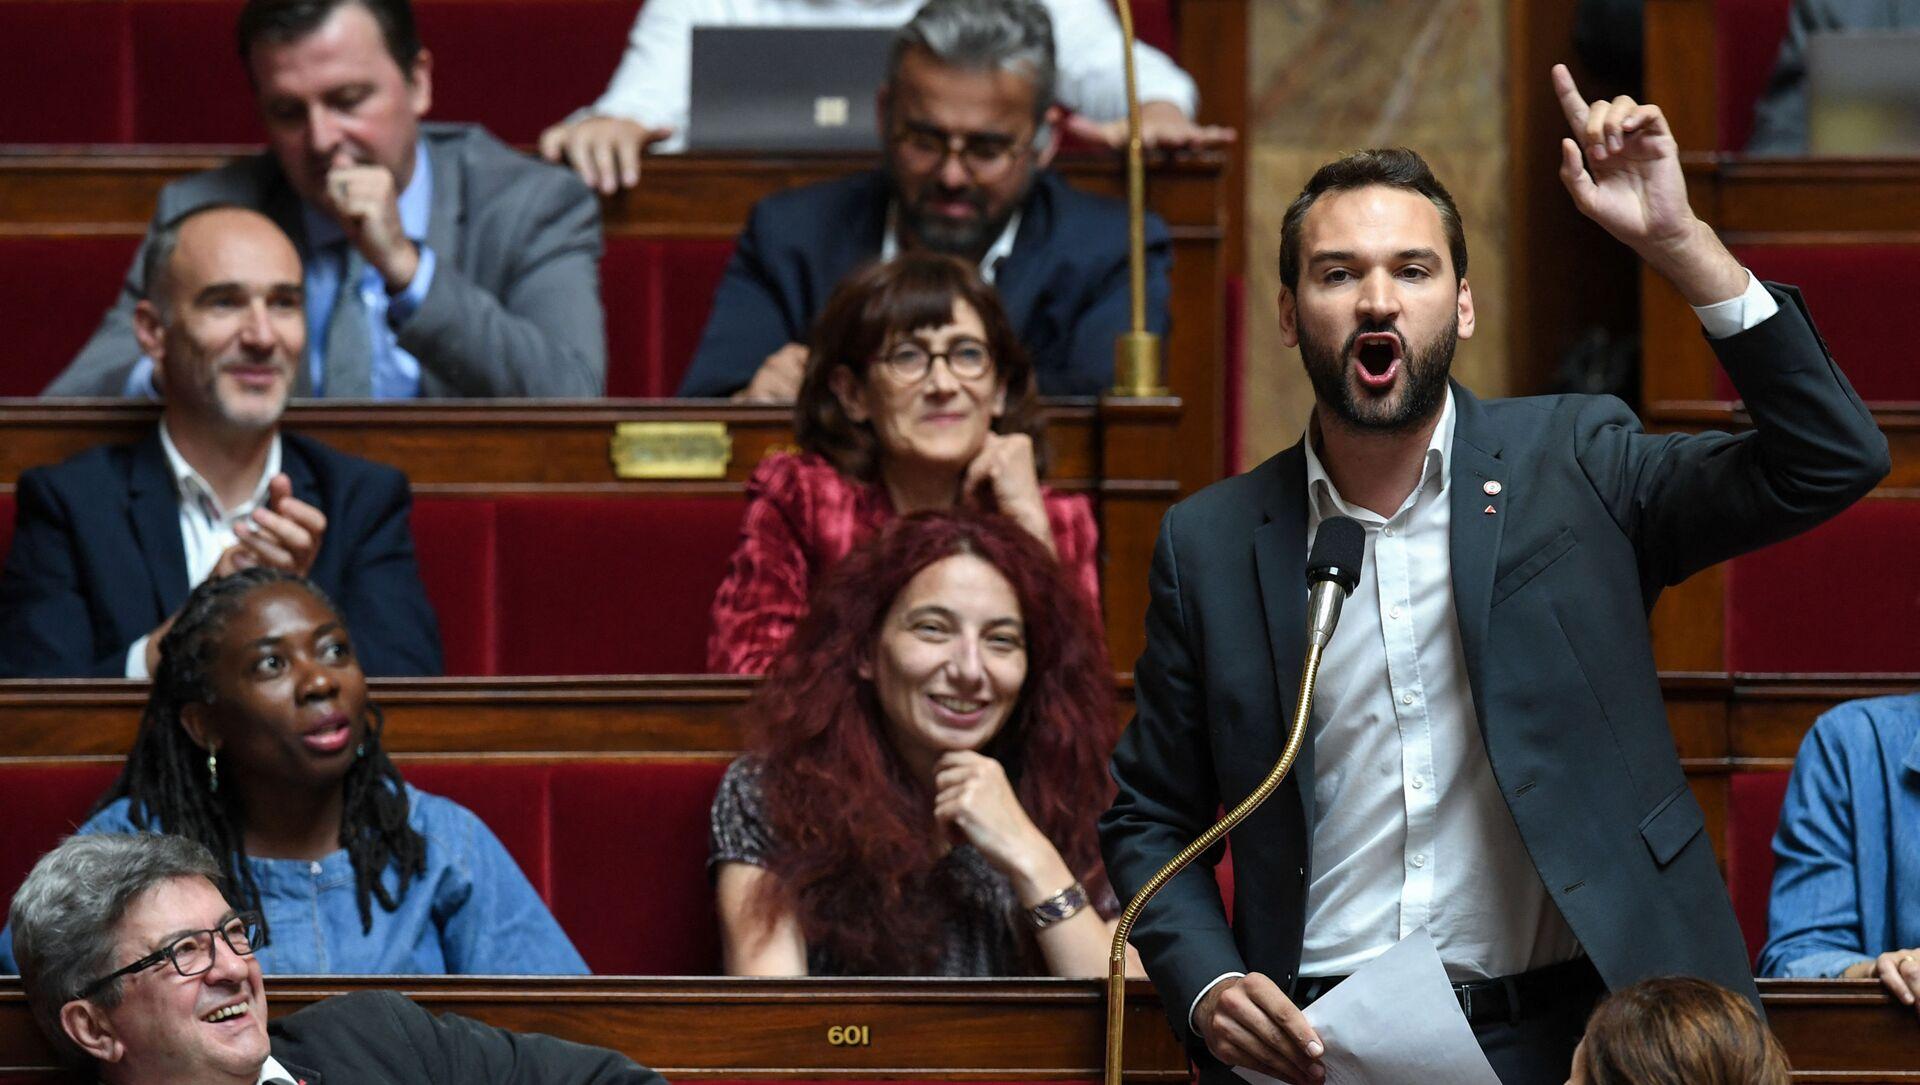 Ugo Bernalicis à l'Assemblée nationale, juillet 2019 - Sputnik France, 1920, 05.08.2021